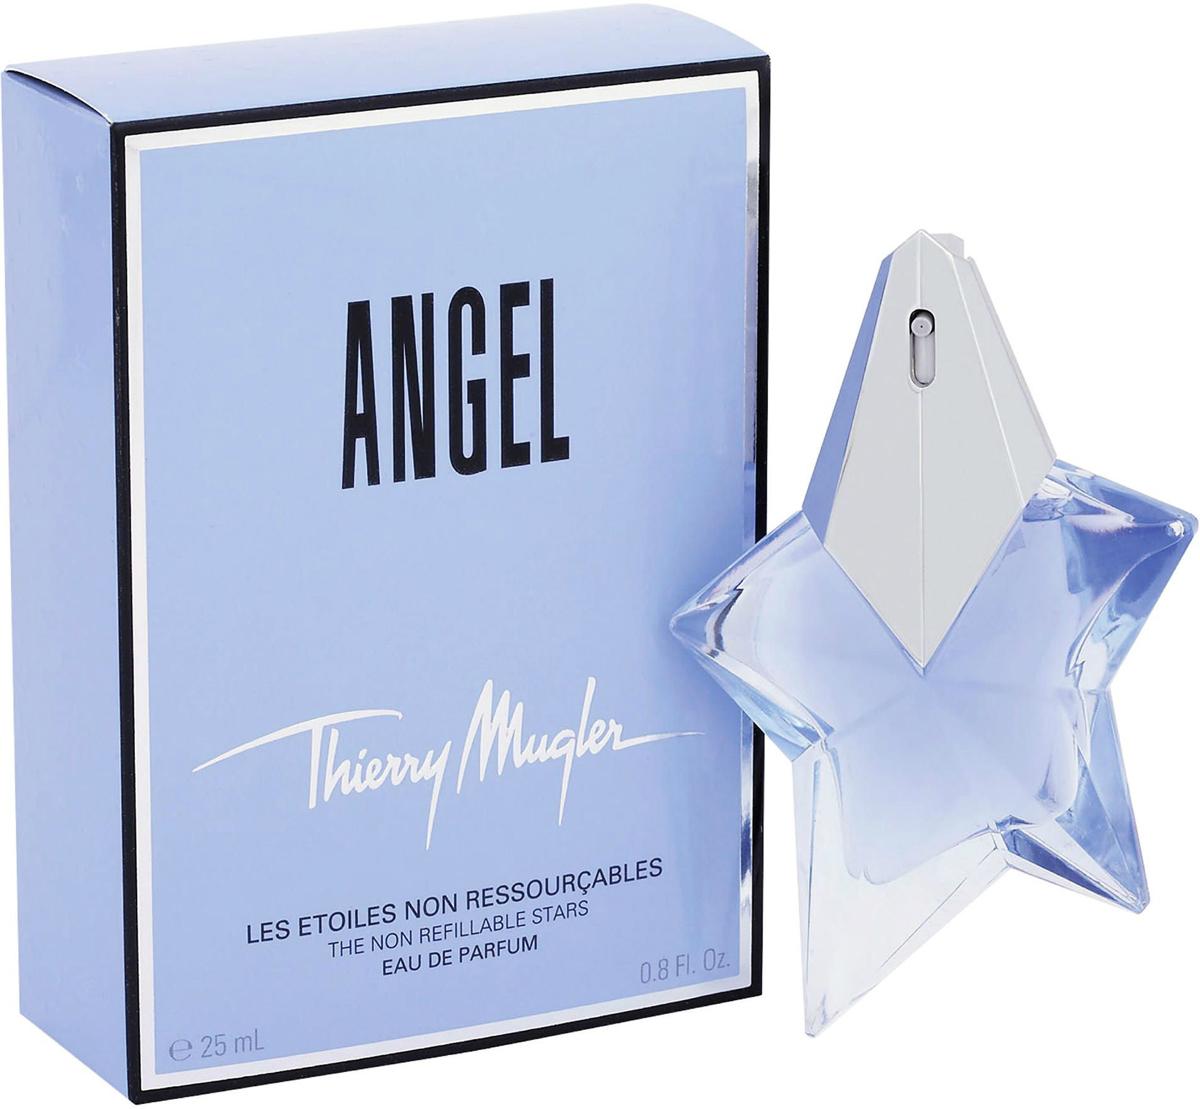 "Thierry Mugler Парфюмированная вода ""Angel"", женская, 25 мл"